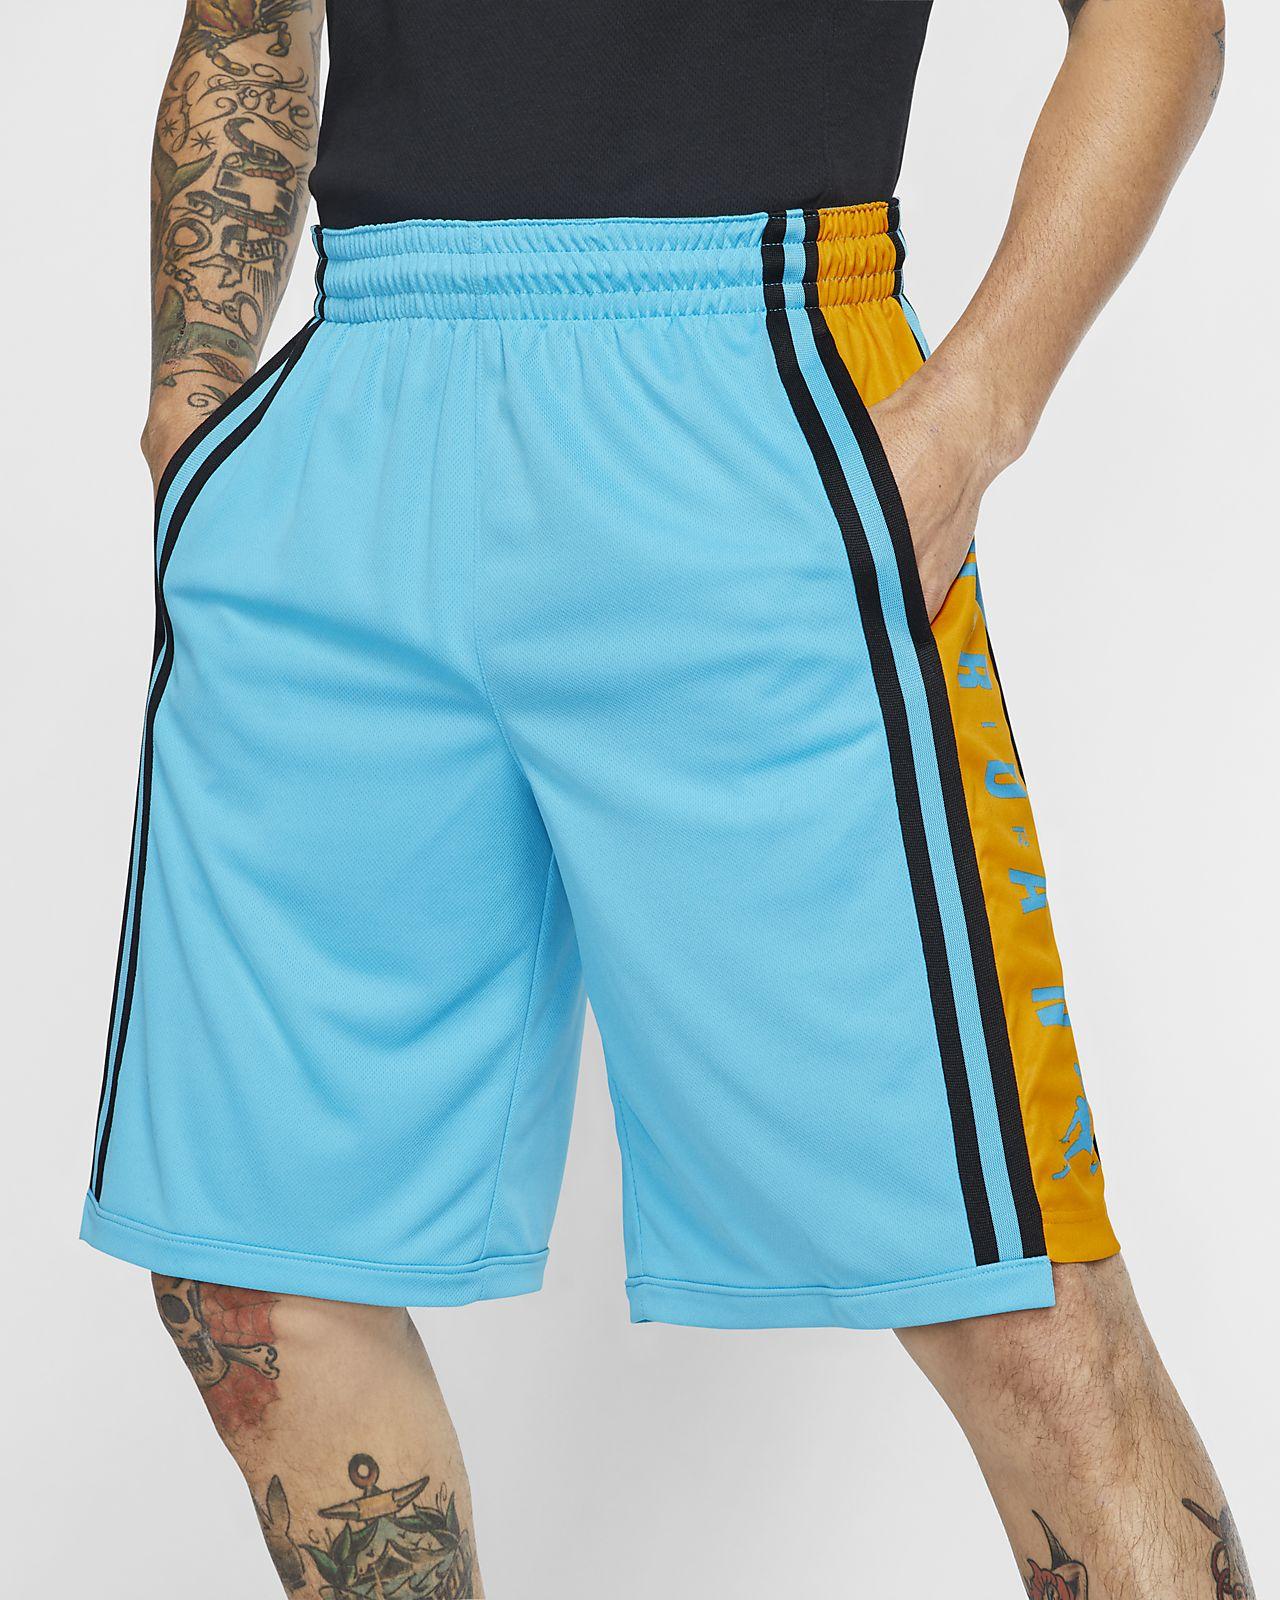 Jordan HBR 男子篮球短裤